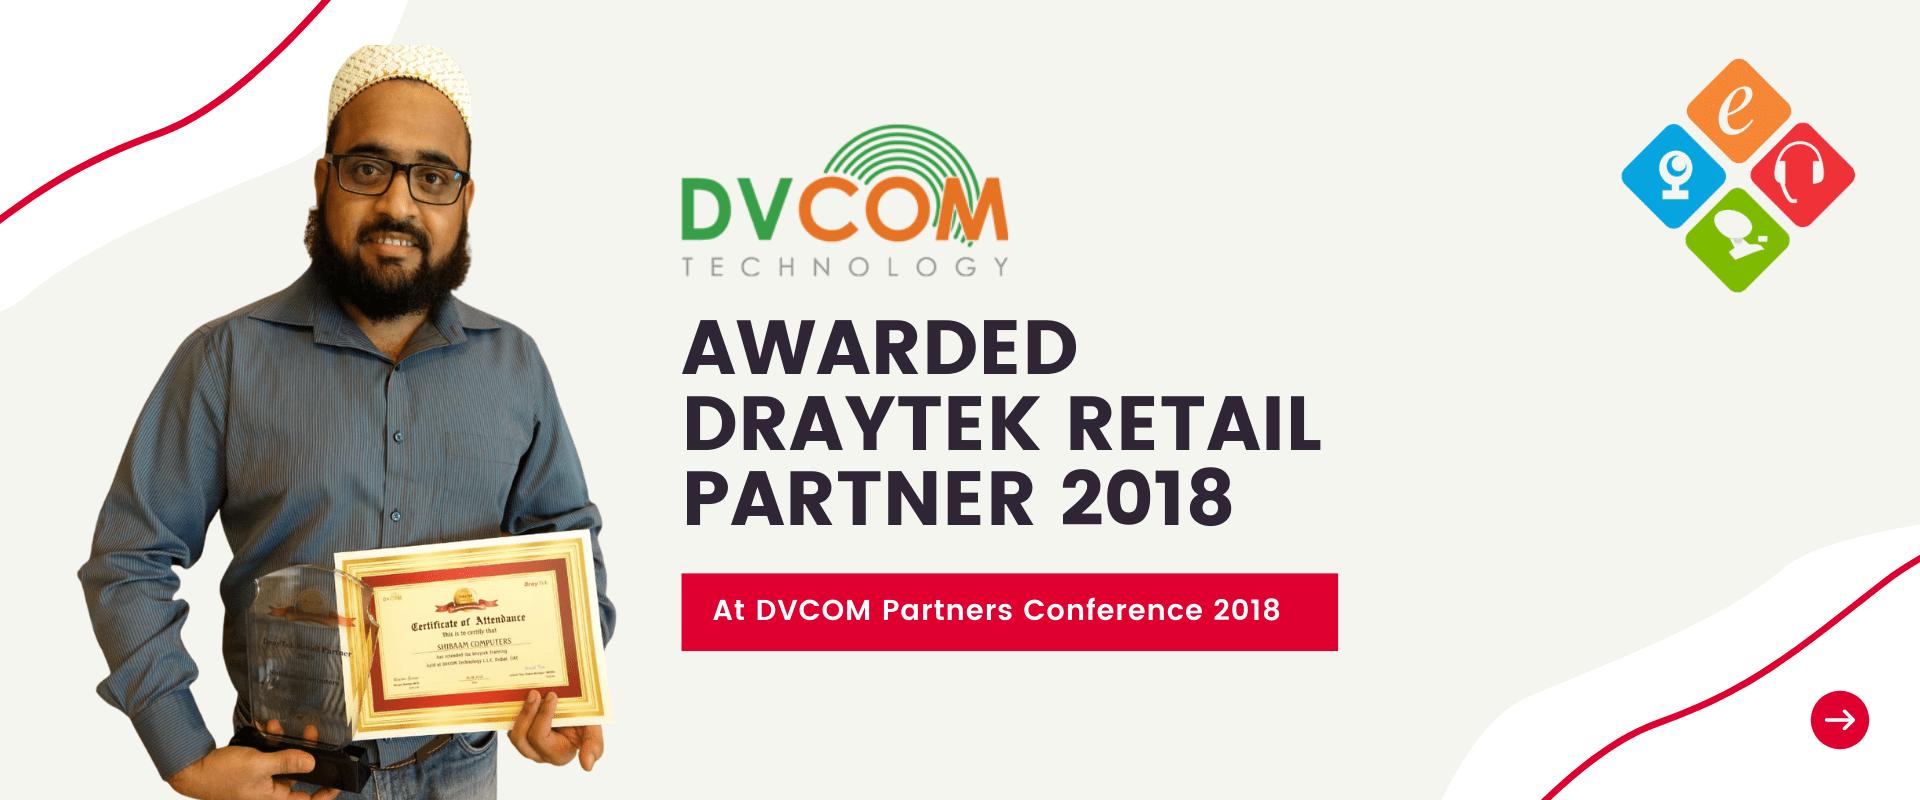 DVCOM Awarded Draytek Retail Partner 2018 to Shibaam Computers LLC Dubai